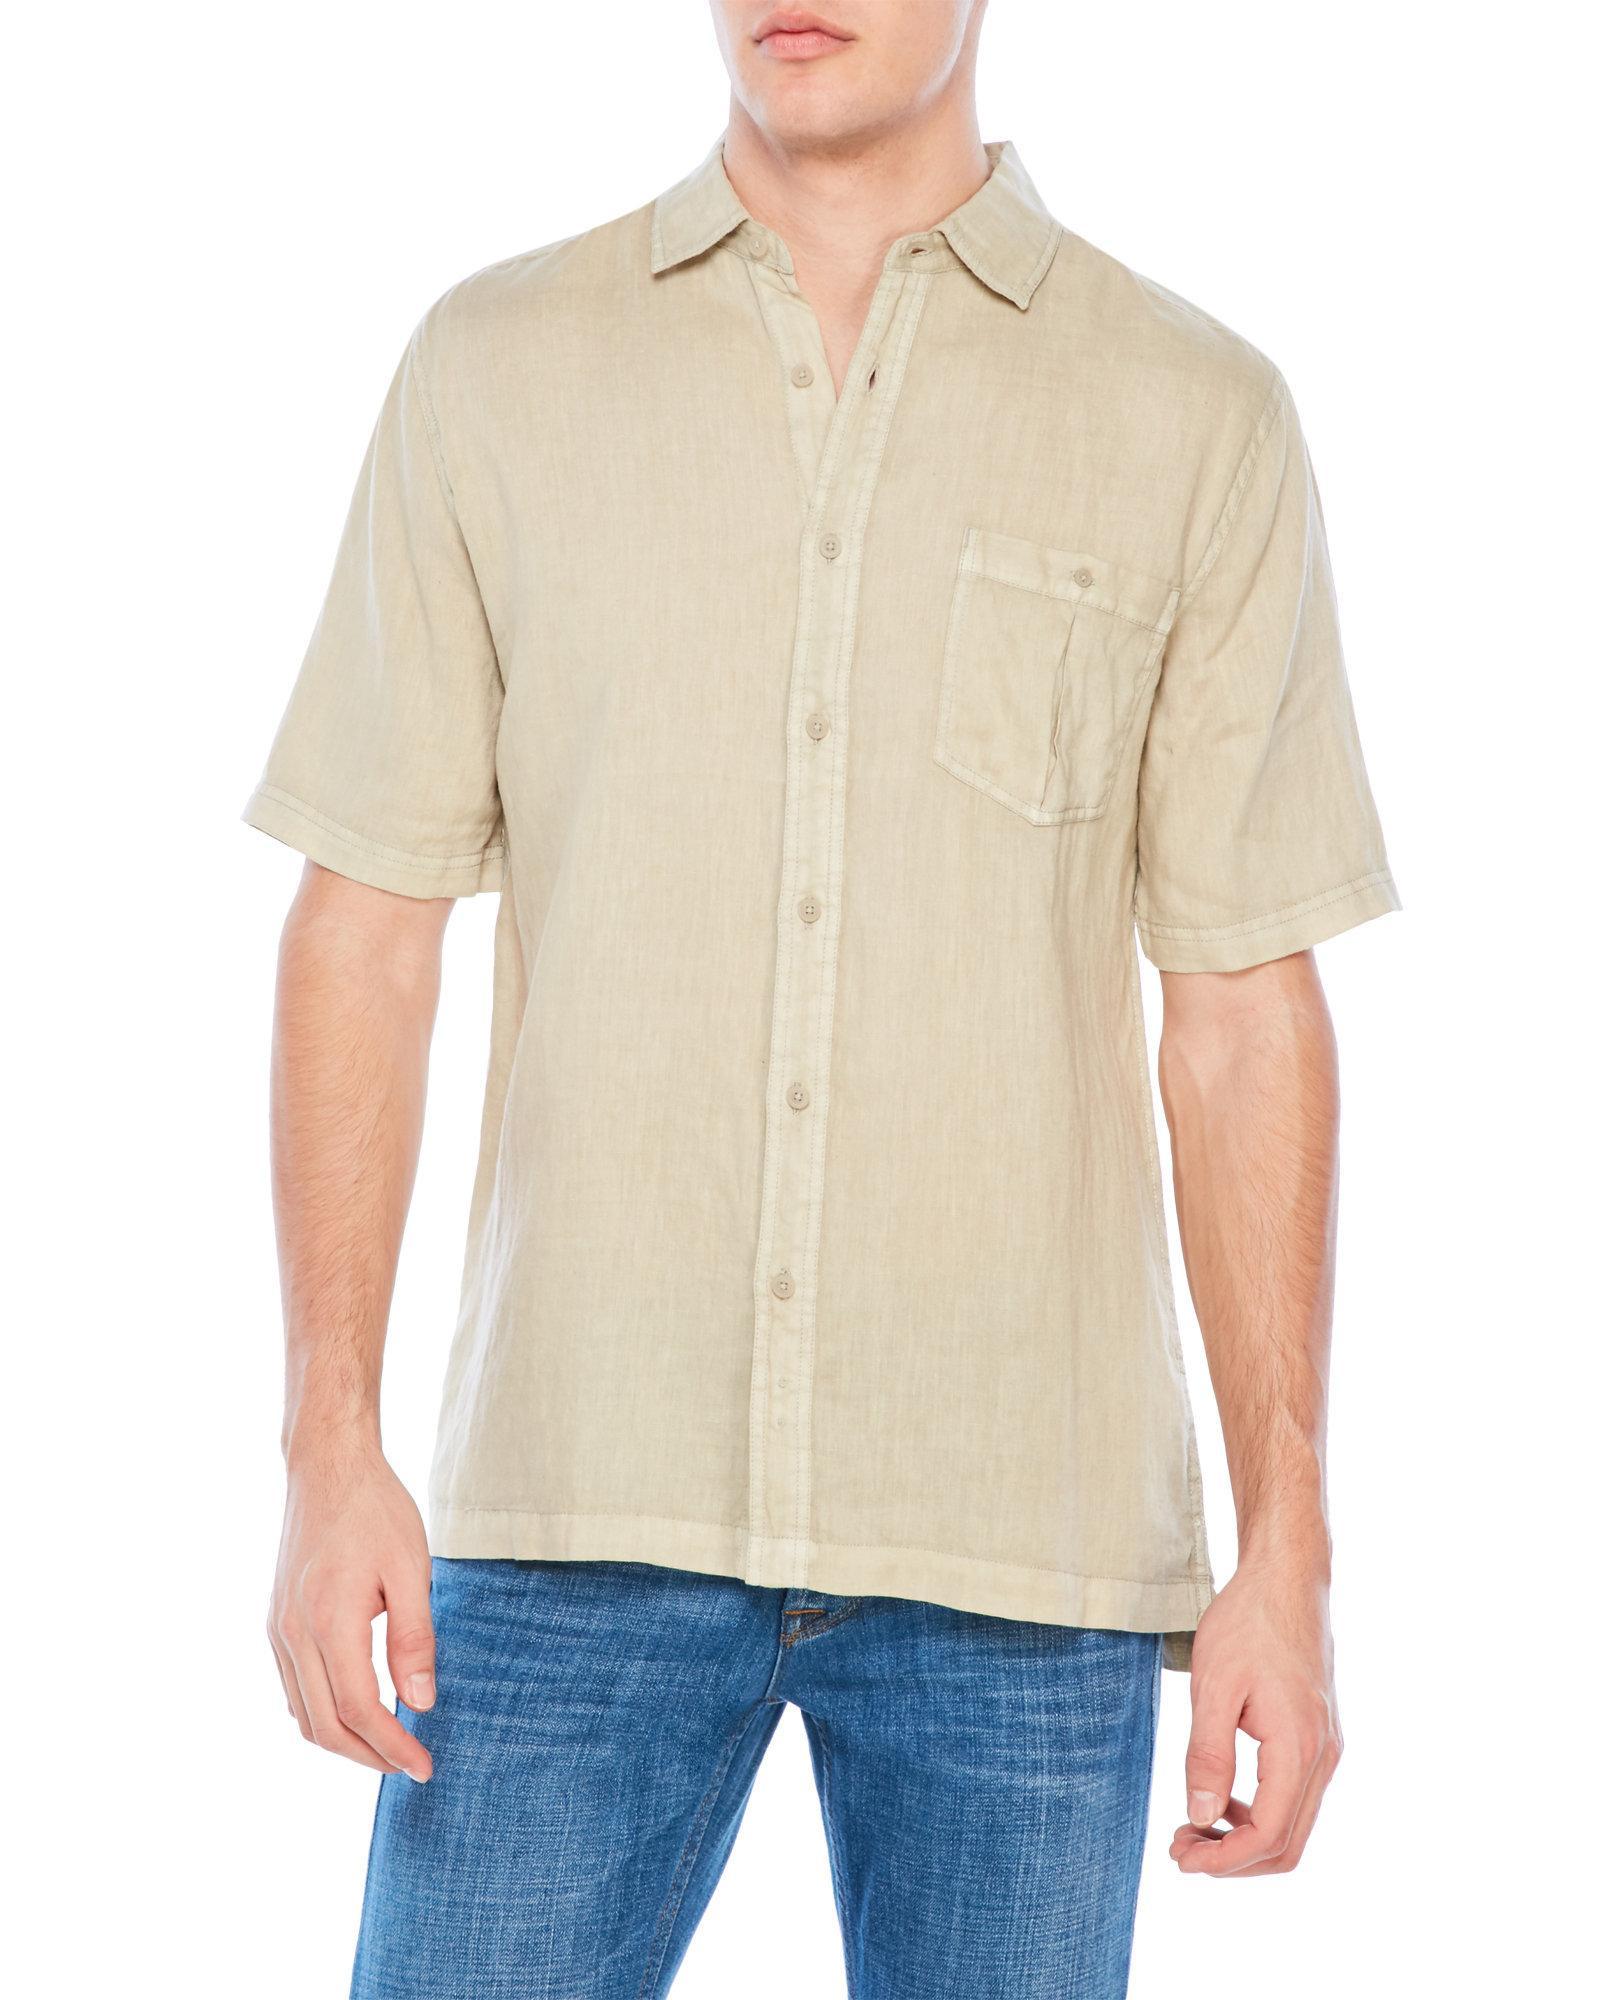 Raffi linen patch pocket shirt in natural for men lyst for Century 21 dress shirts